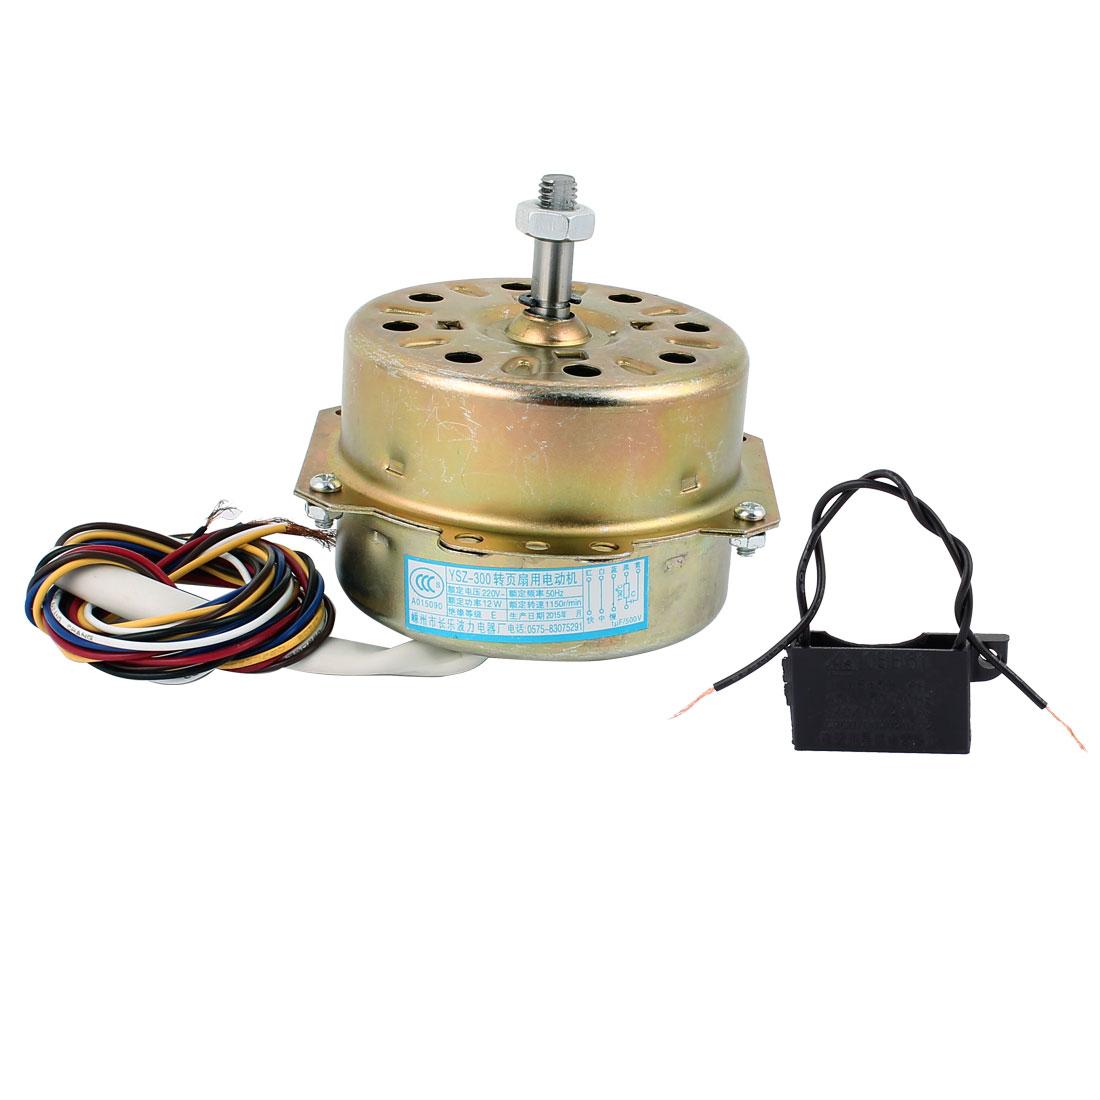 AC 220V 12W 1150RPM 8mmx25mm Shaft Dual Bearing Ball Electric Ventilator Fan Motor